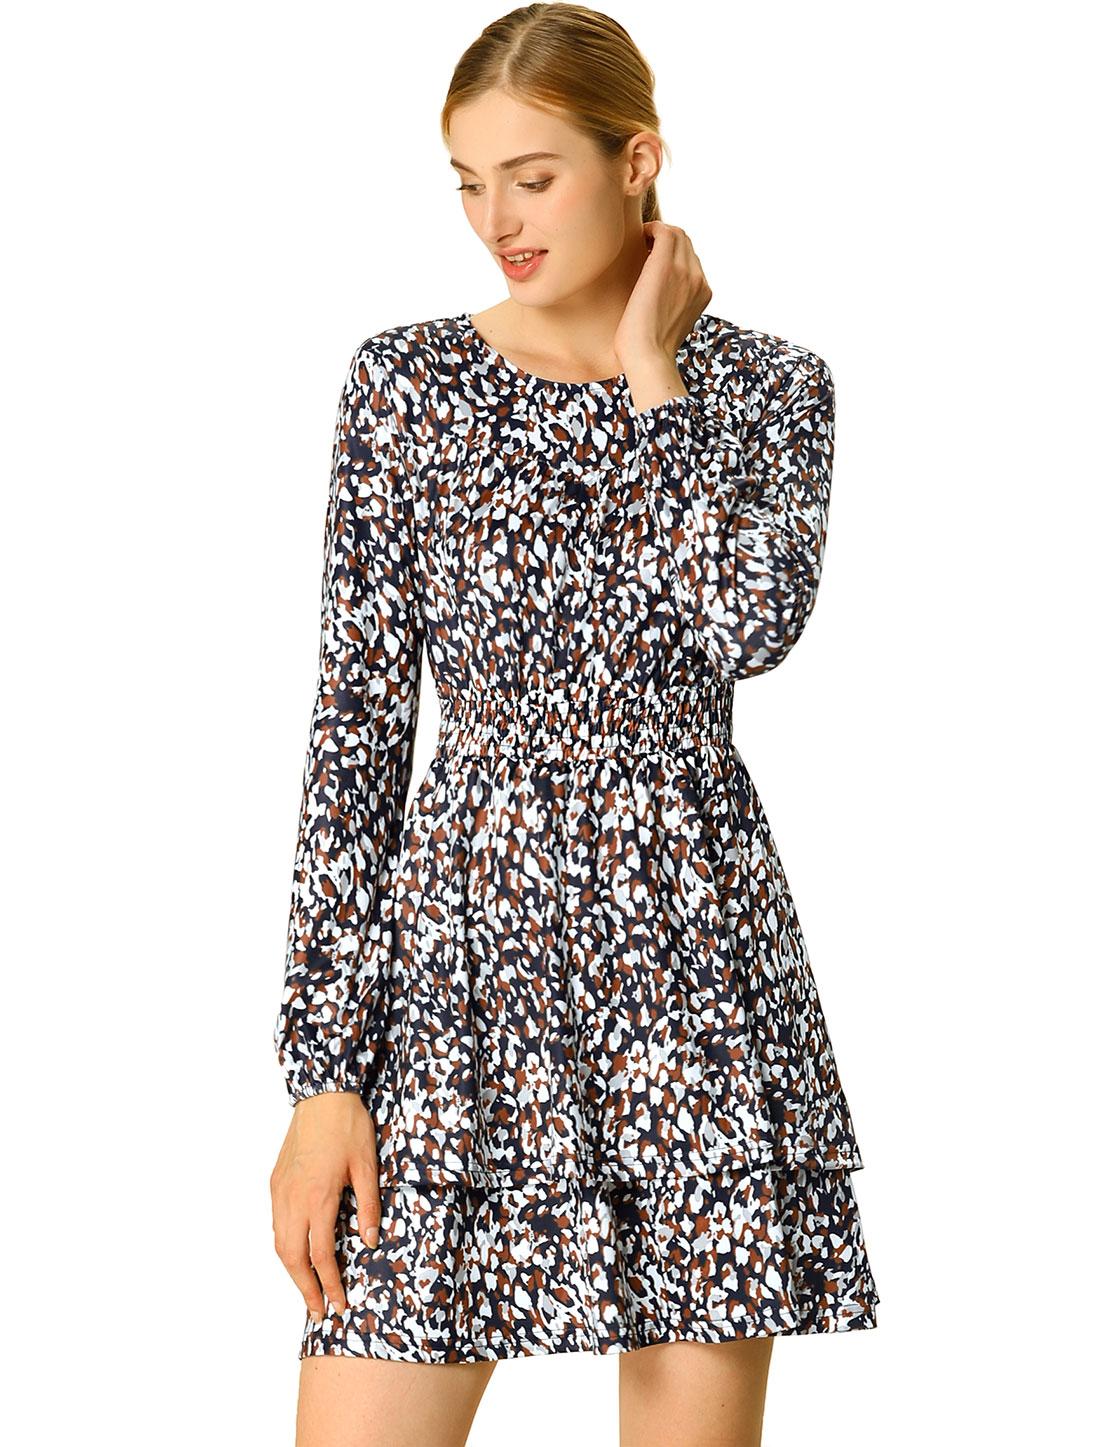 Women's Leopard Print Long Sleeve Layered Ruffle Hem Dress Blue S